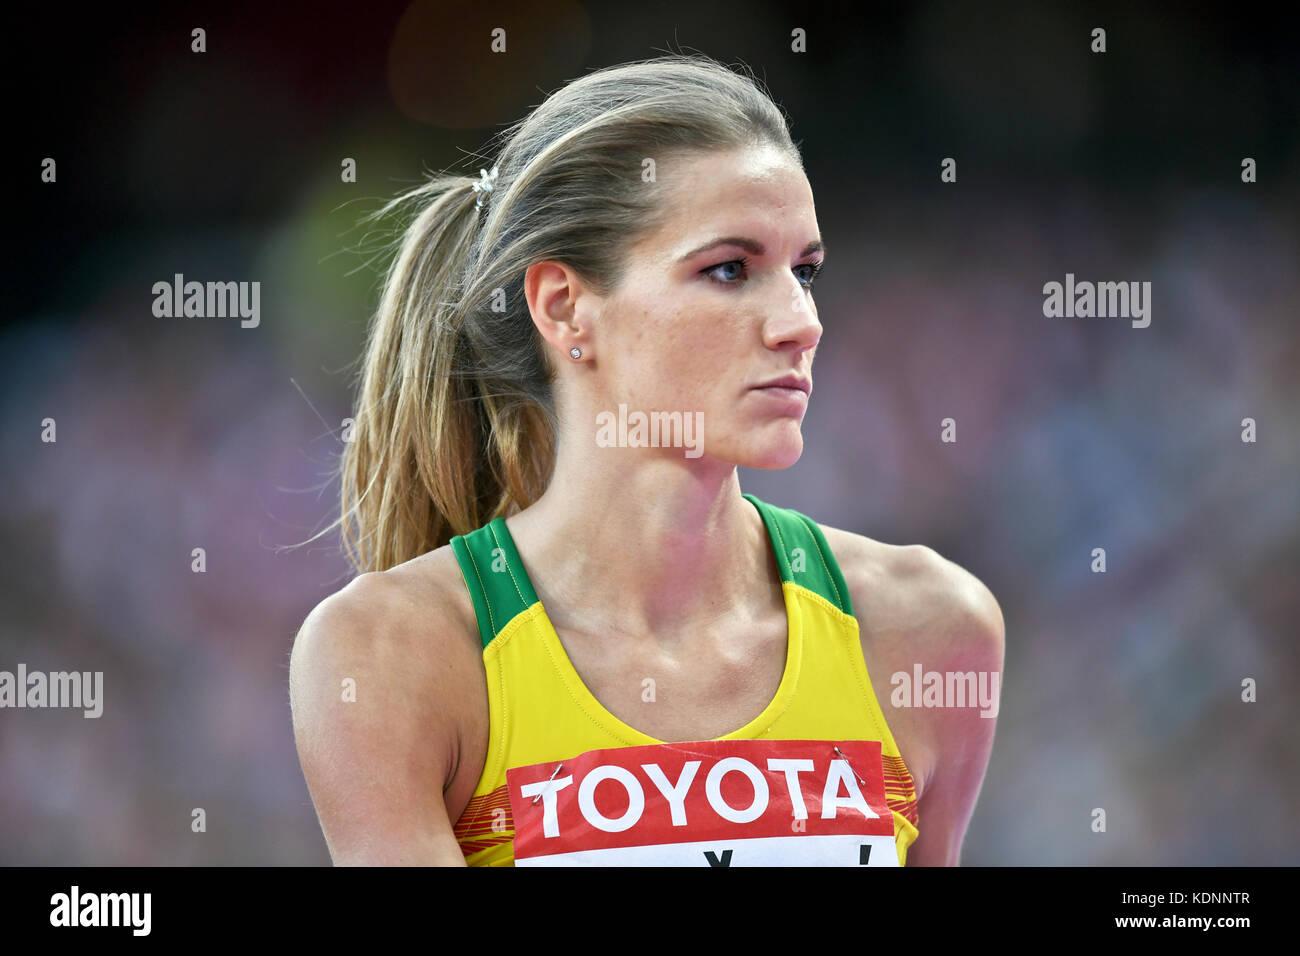 Airin Palyt - High Jump - IAAF World Championships London 2017 - Stock Image